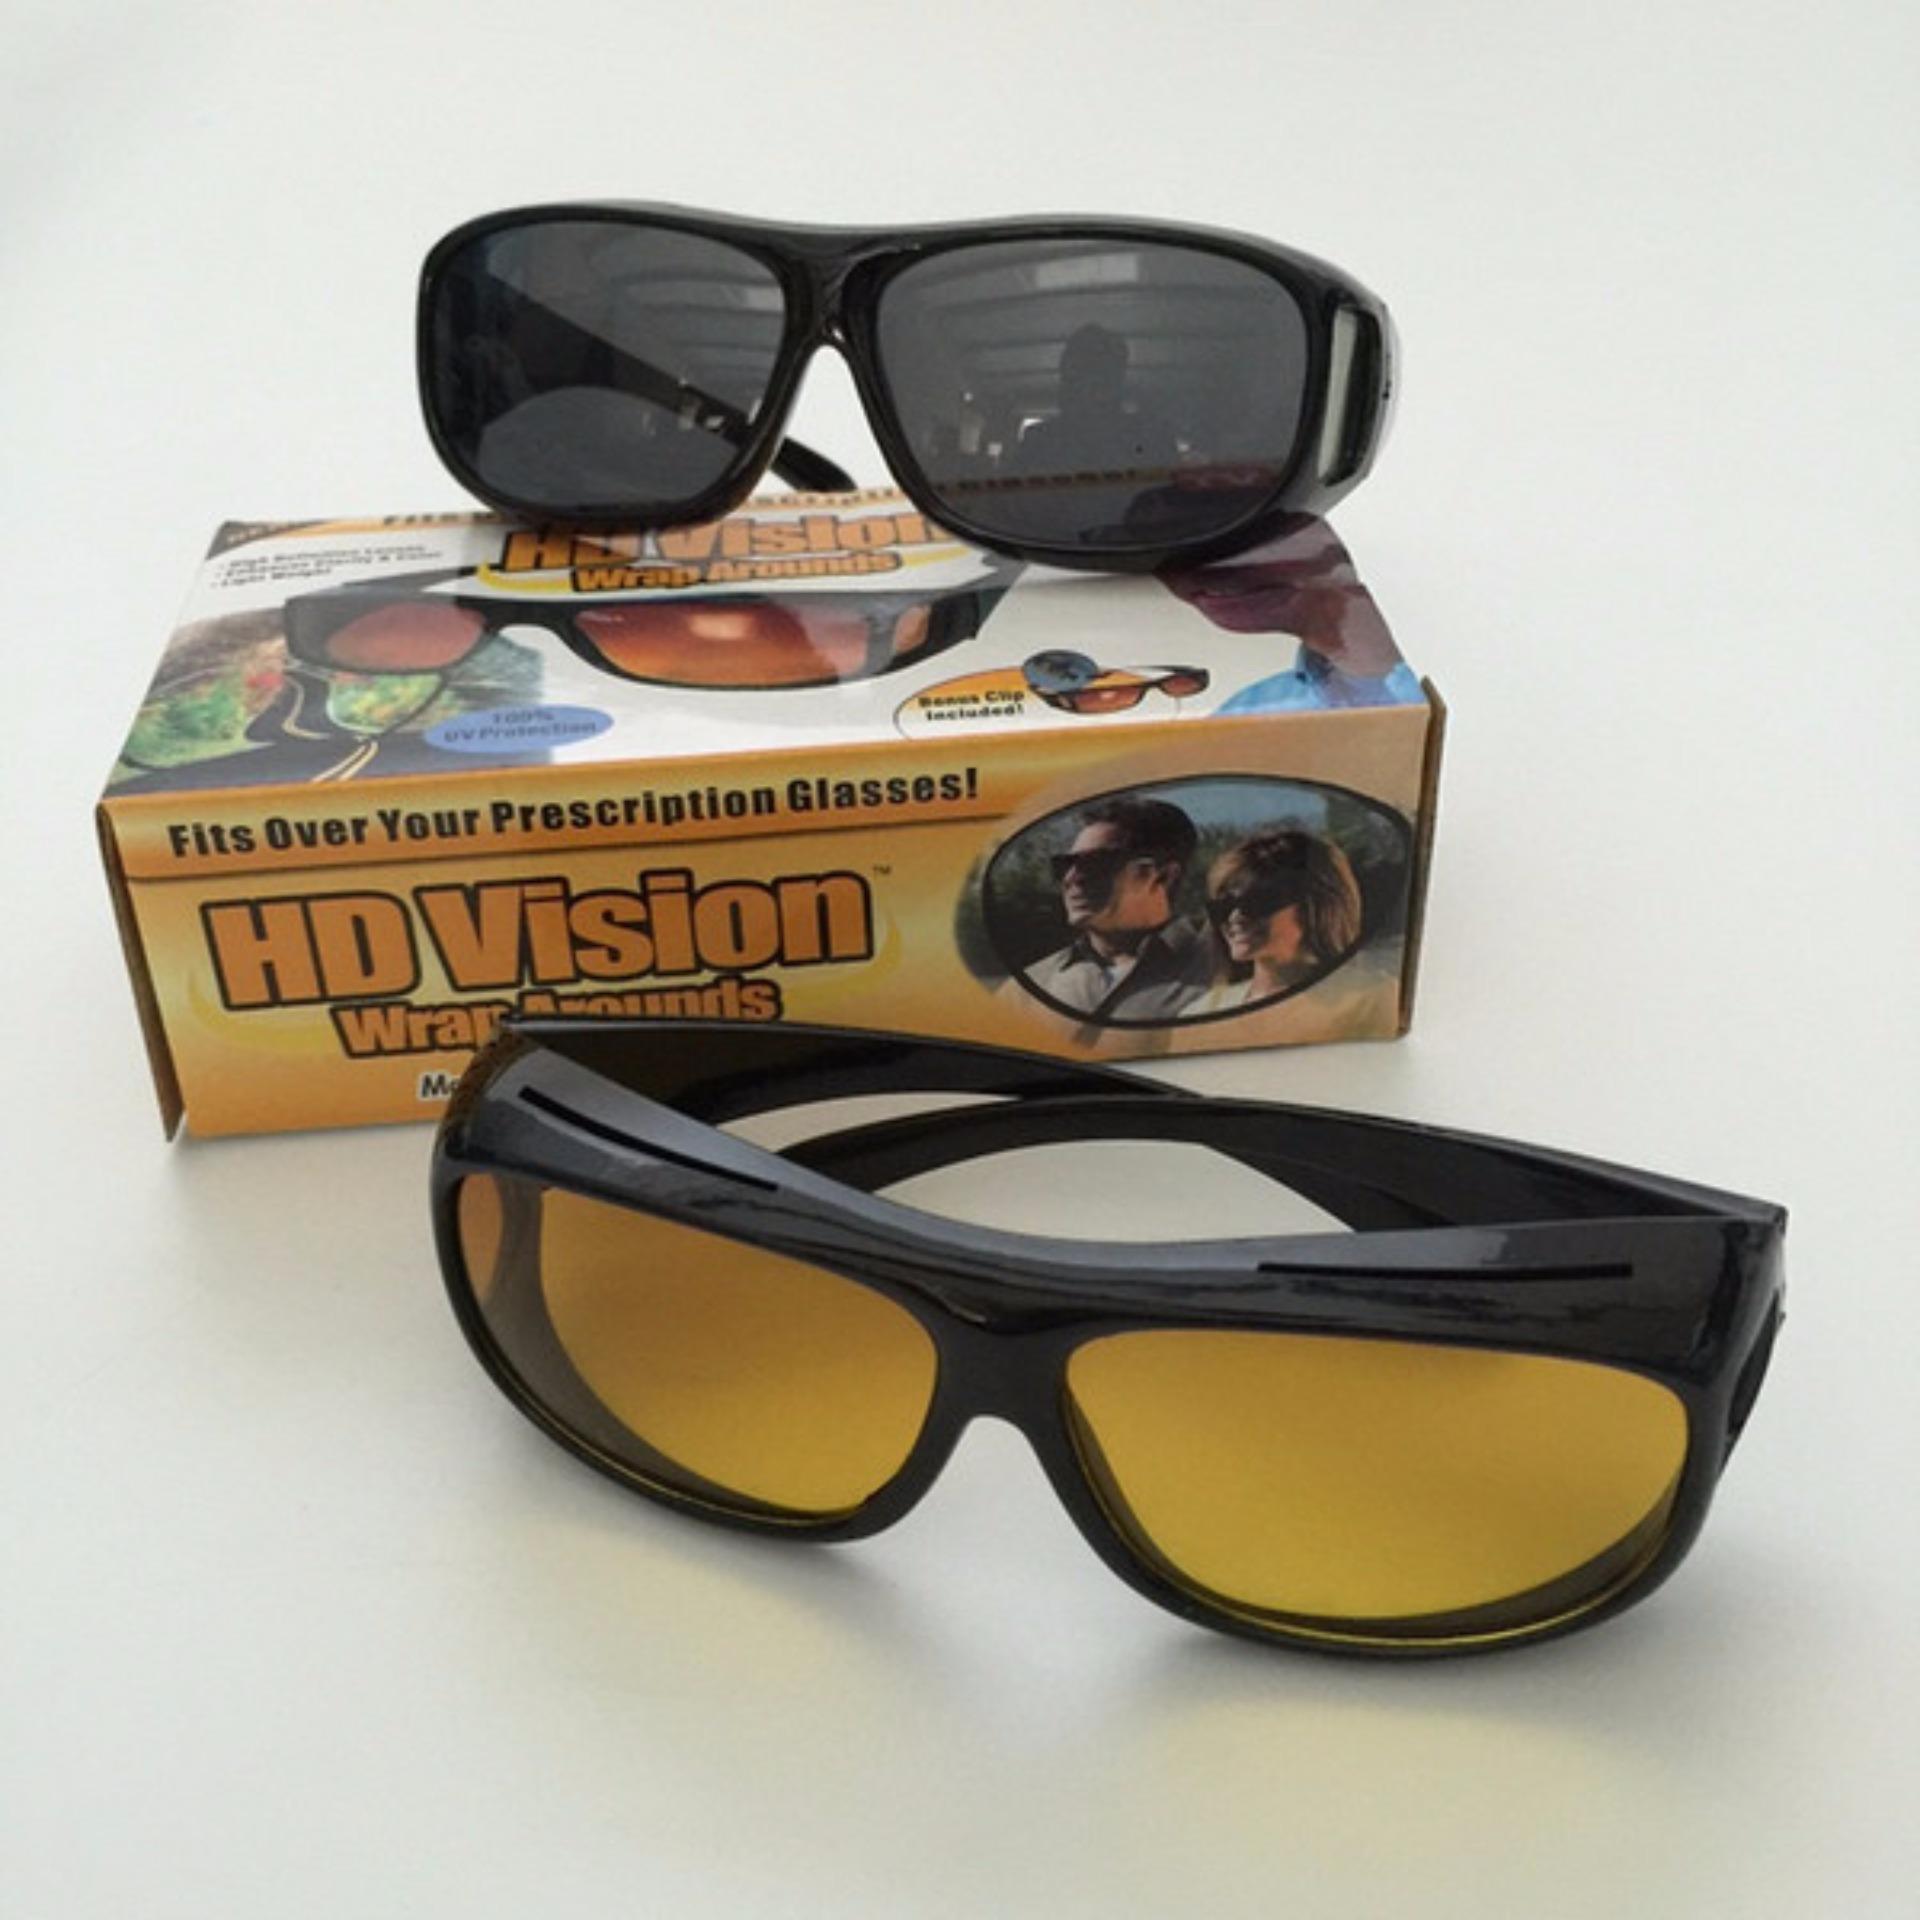 Perbandingan Harga Hd Vision High Quality Kacamata Anti Silau Night View Aimons Glasses Kaca Mata Sport Version Touring 2pcs Untuk Siang Dan Malam